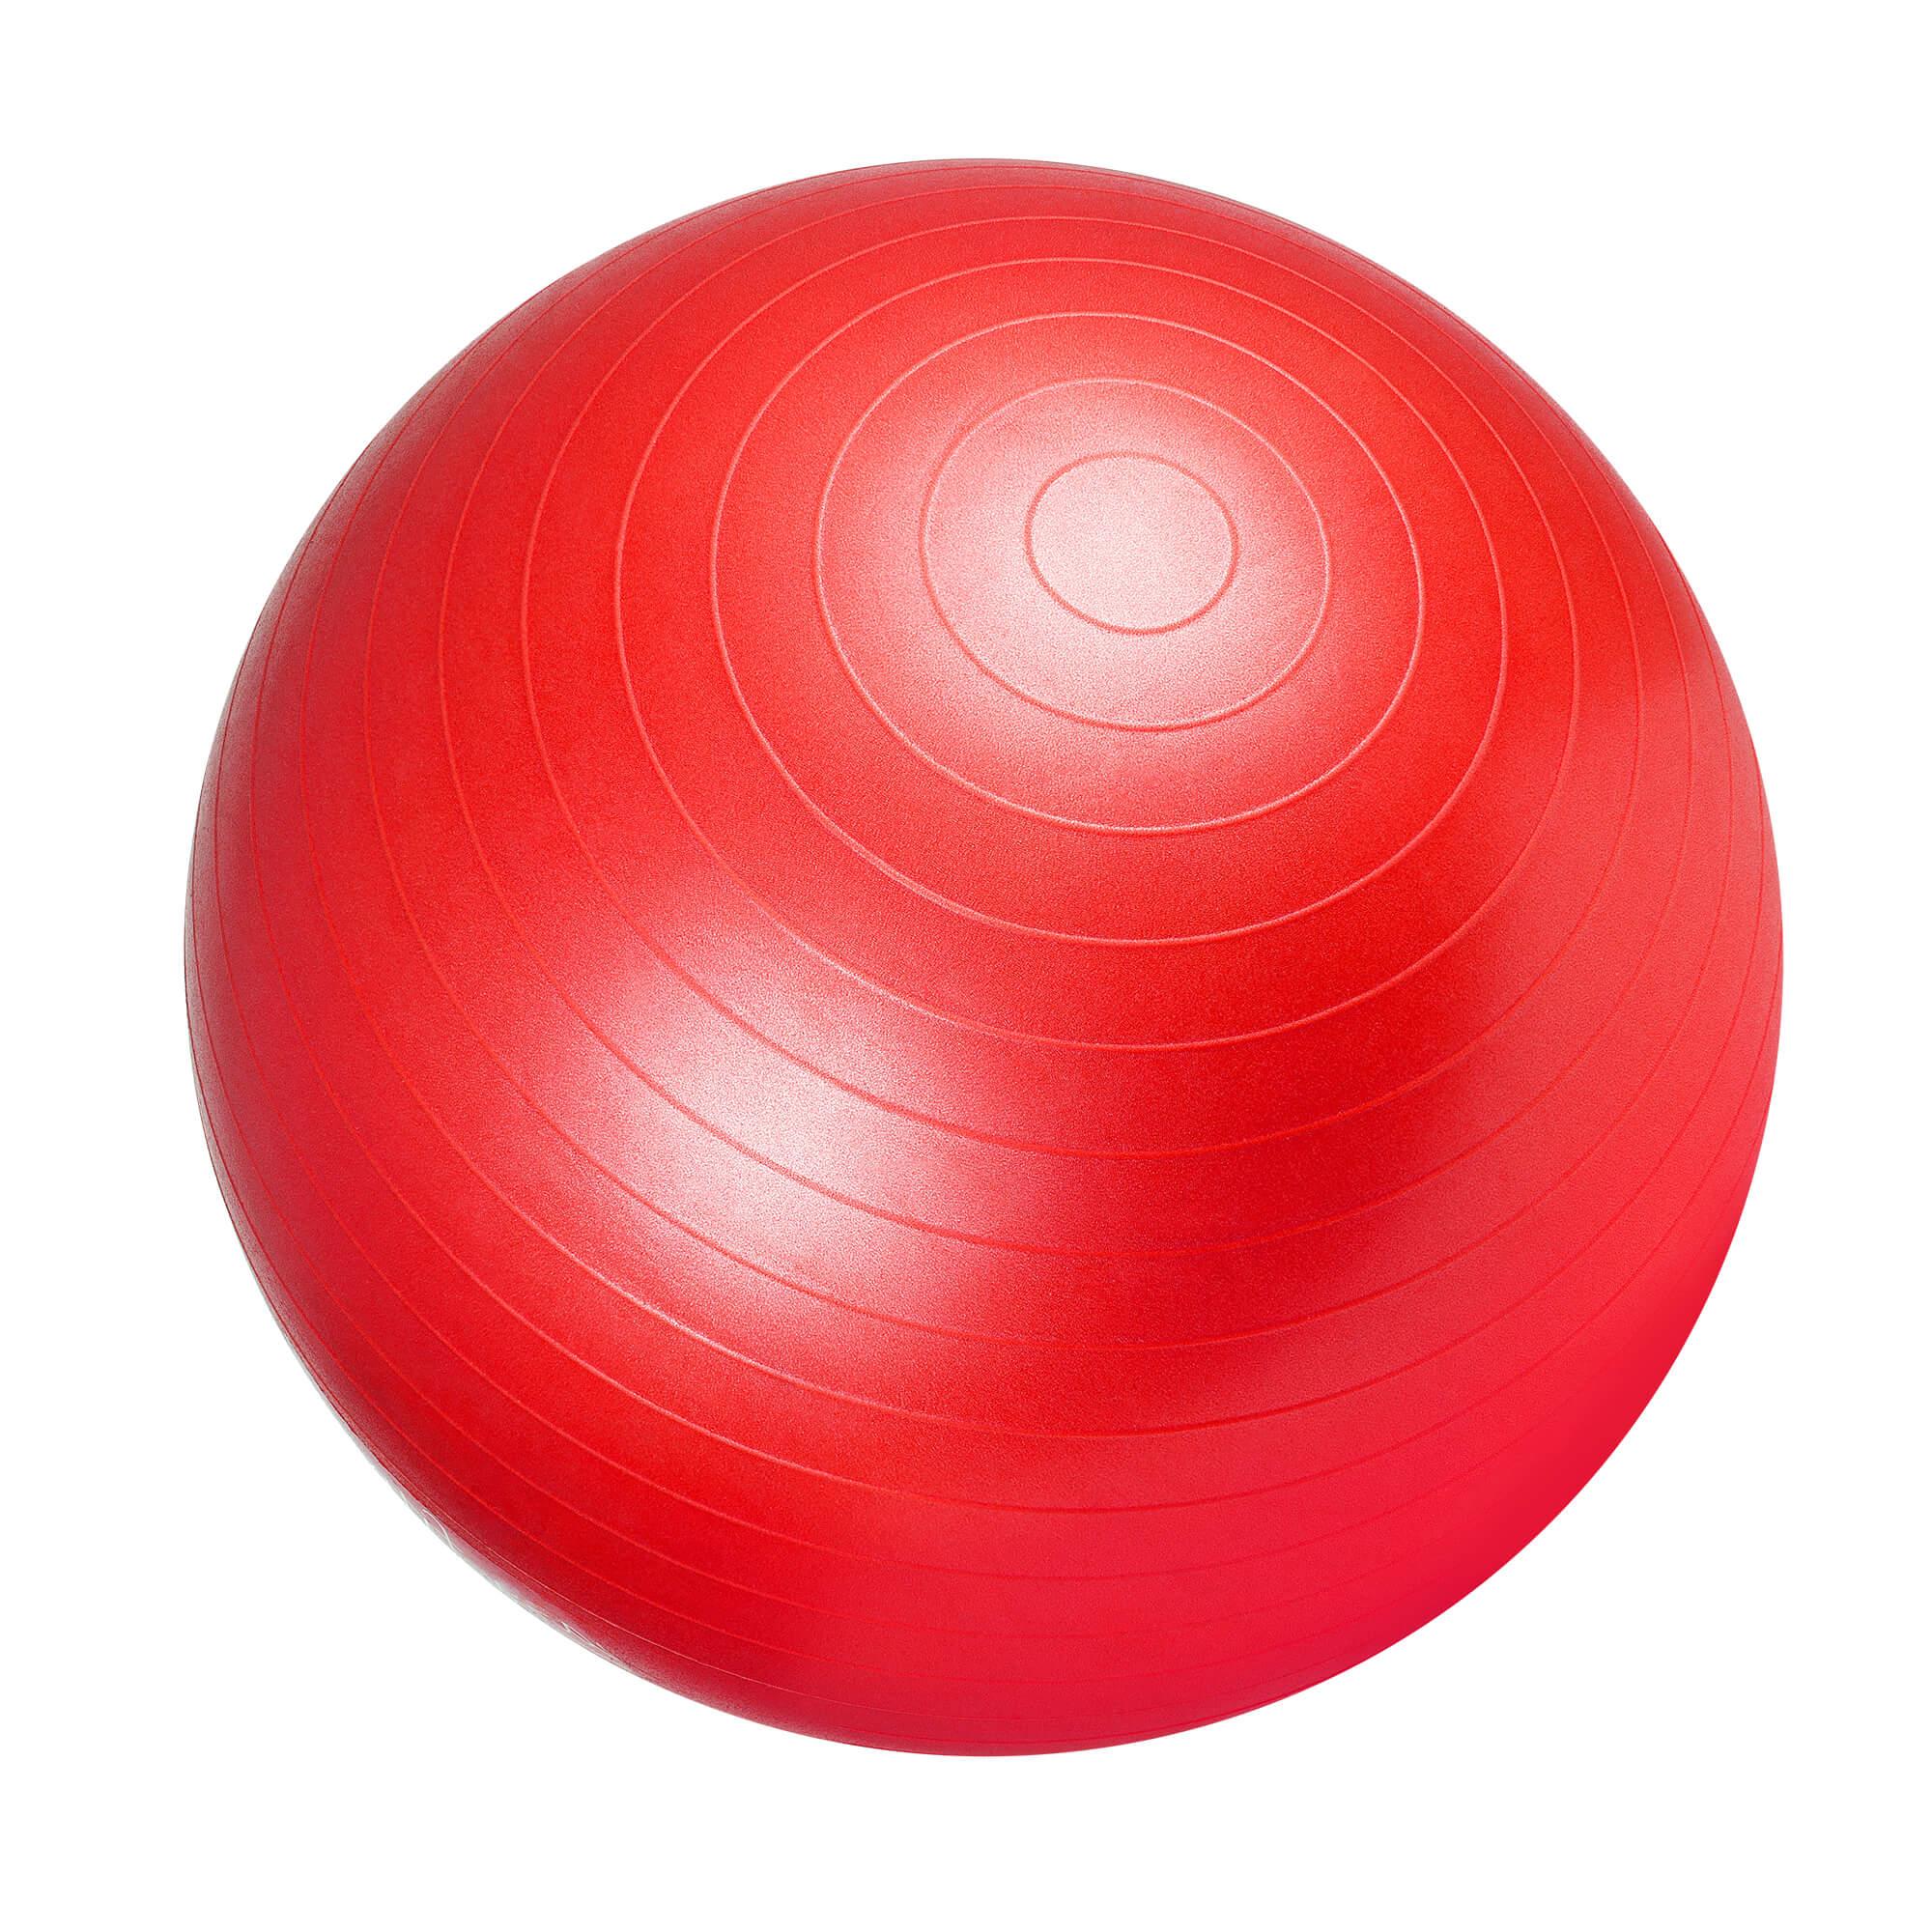 Gorilla Sports Gymnastikball 75 cm Rot Luftpumpe 100490-00038-0061